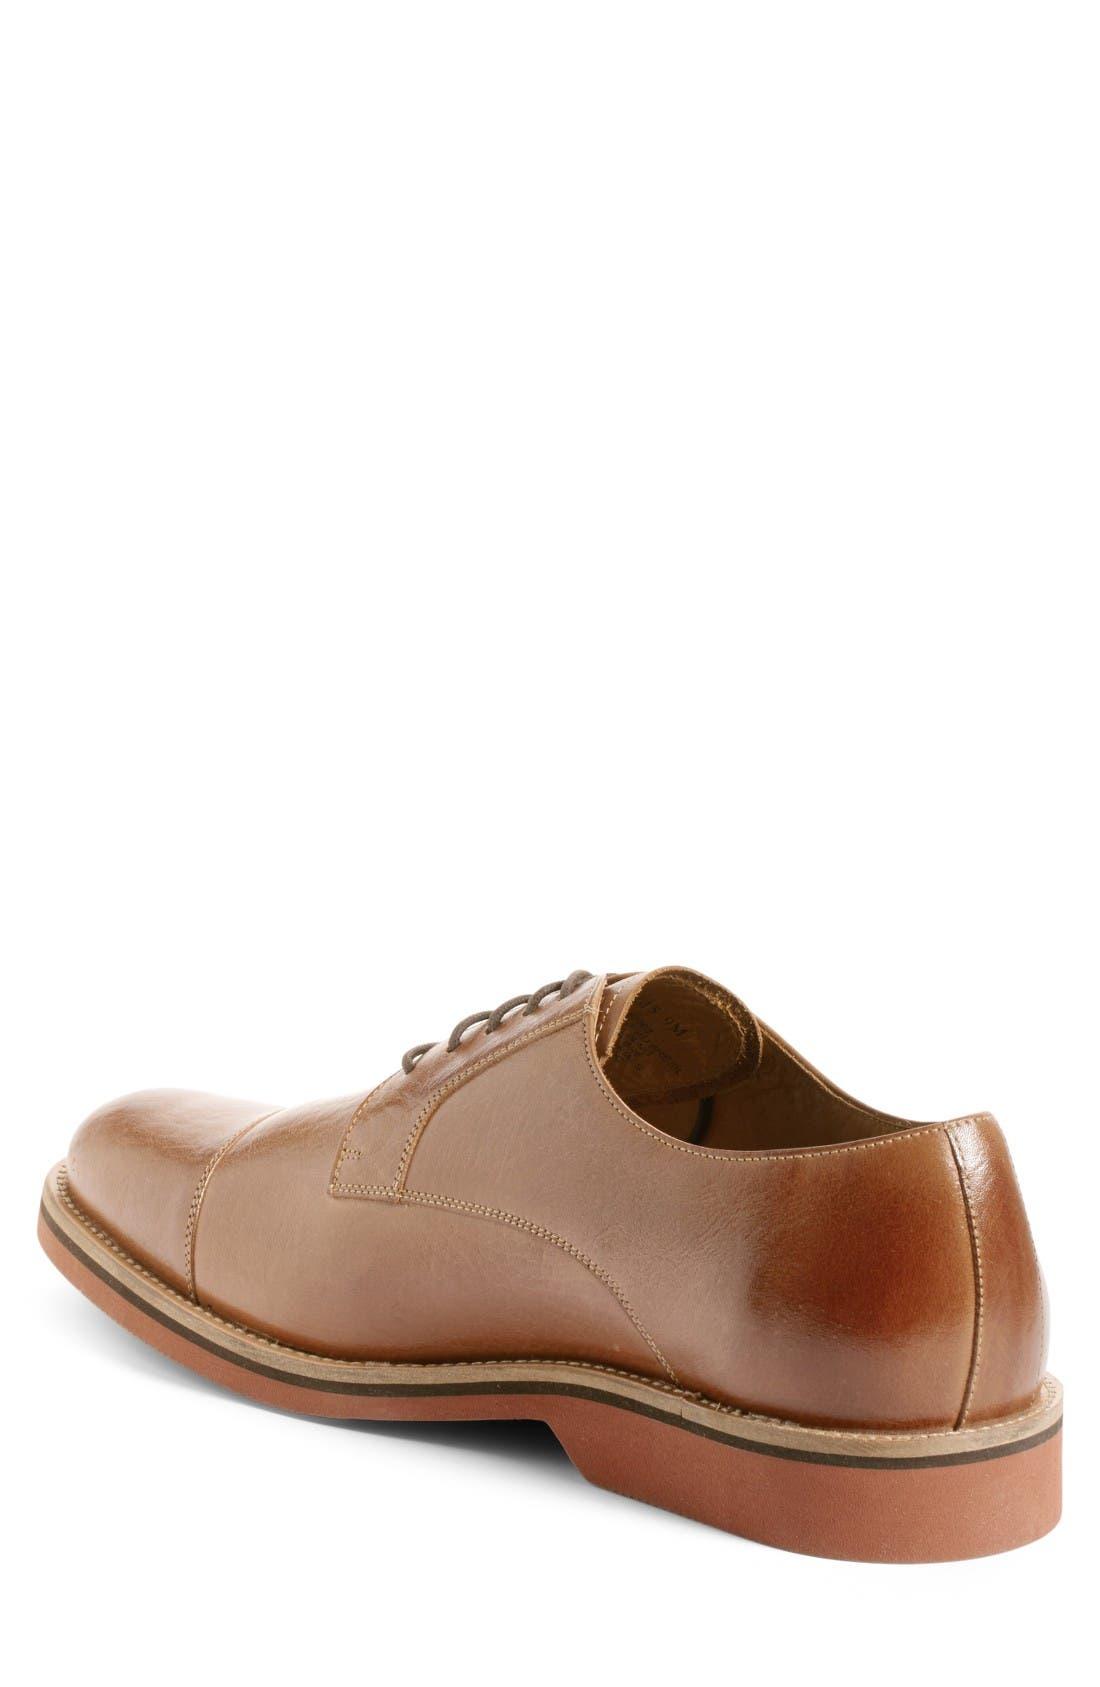 Poulsbo Cap Toe Derby,                             Alternate thumbnail 2, color,                             Tan Leather